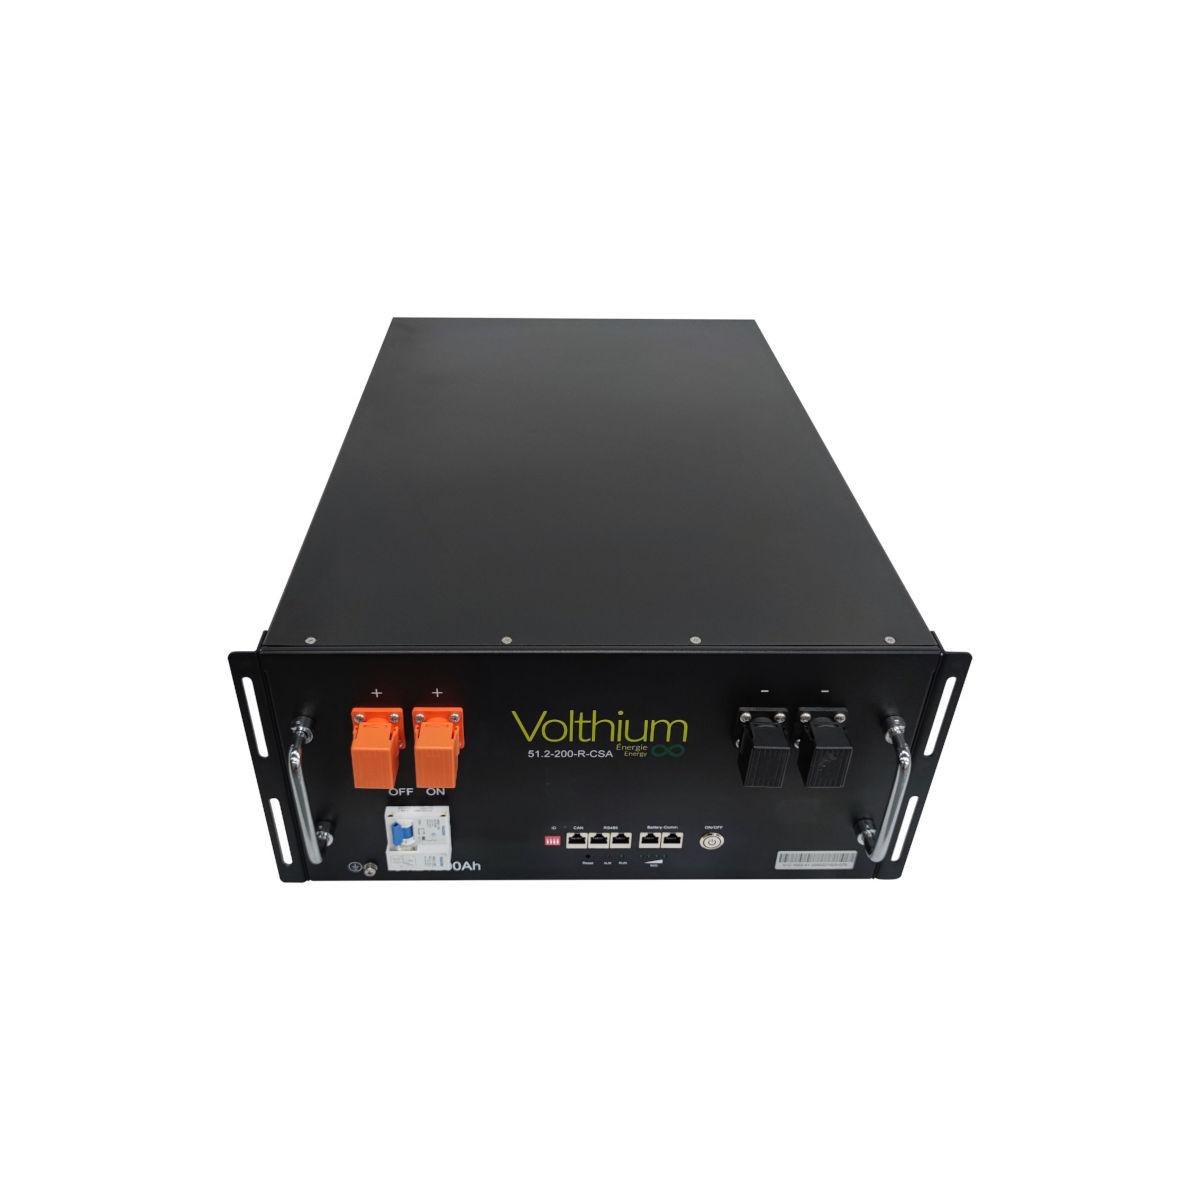 Volthium 48V SC48200RM Rack Mount